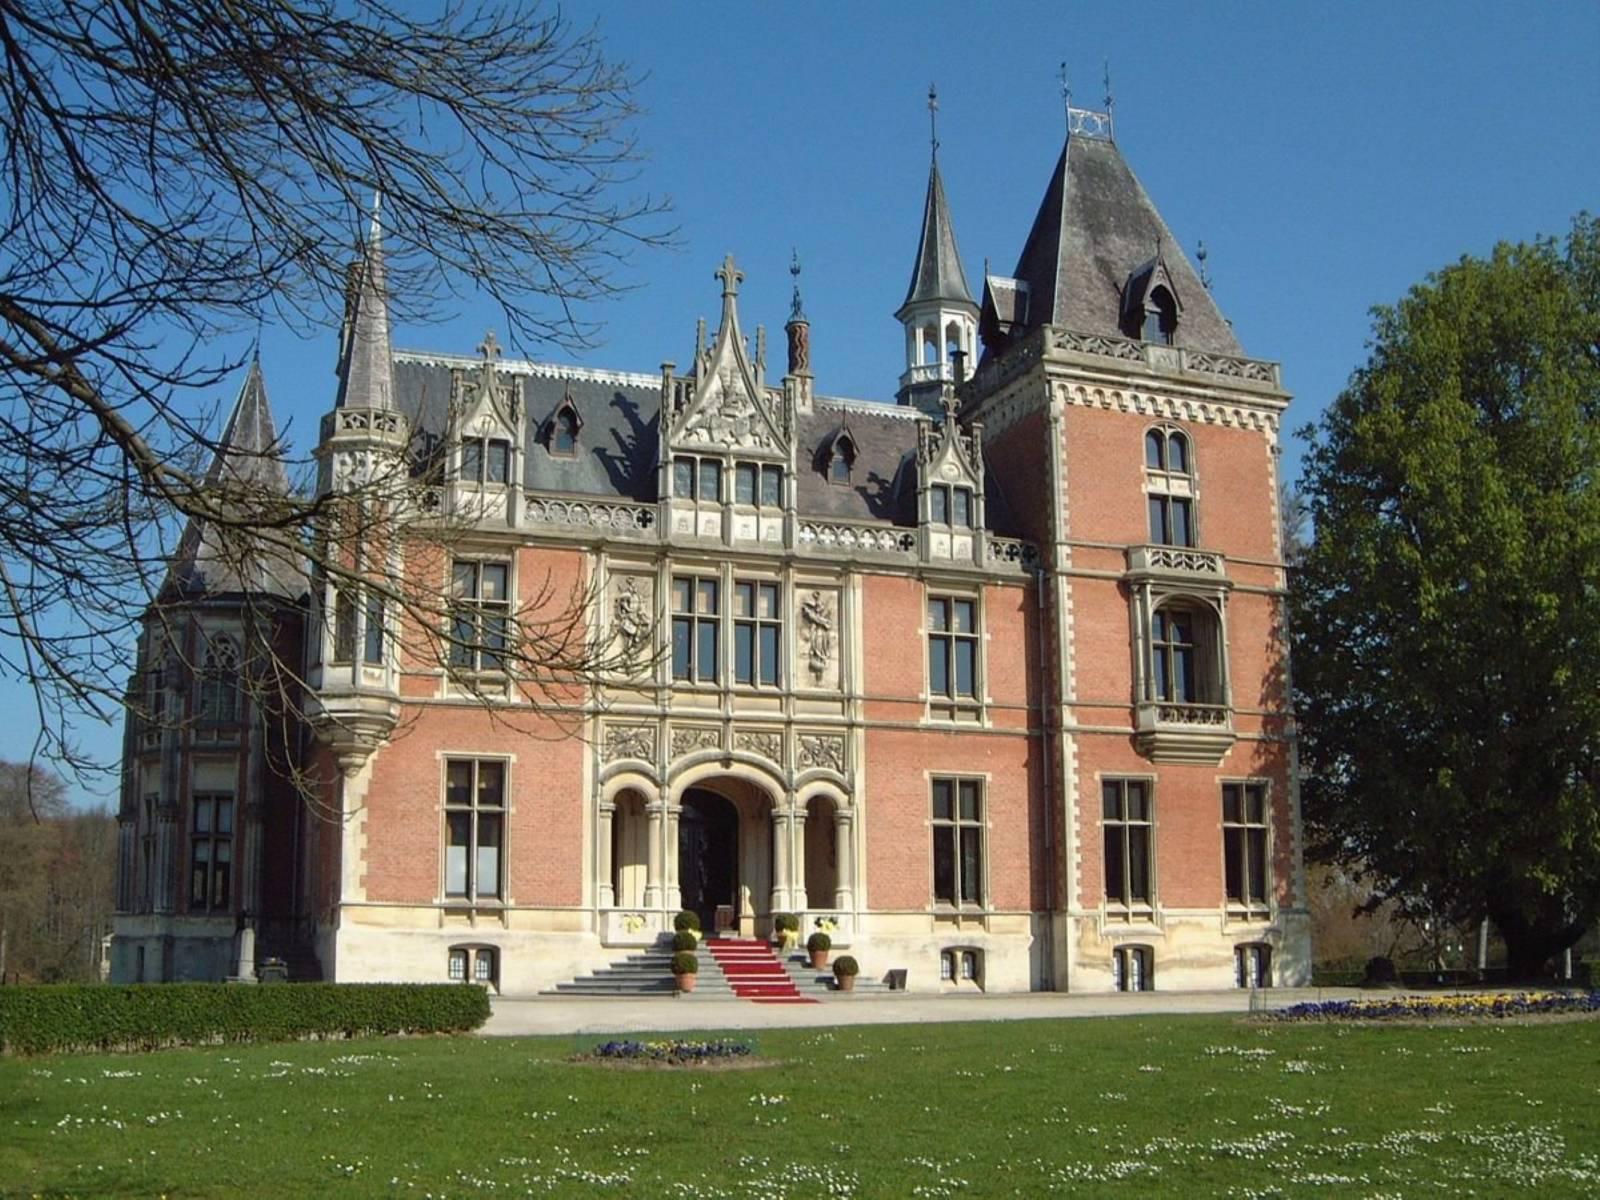 Kasteel D'artrycke - Feestzaal - House of Weddings (7)